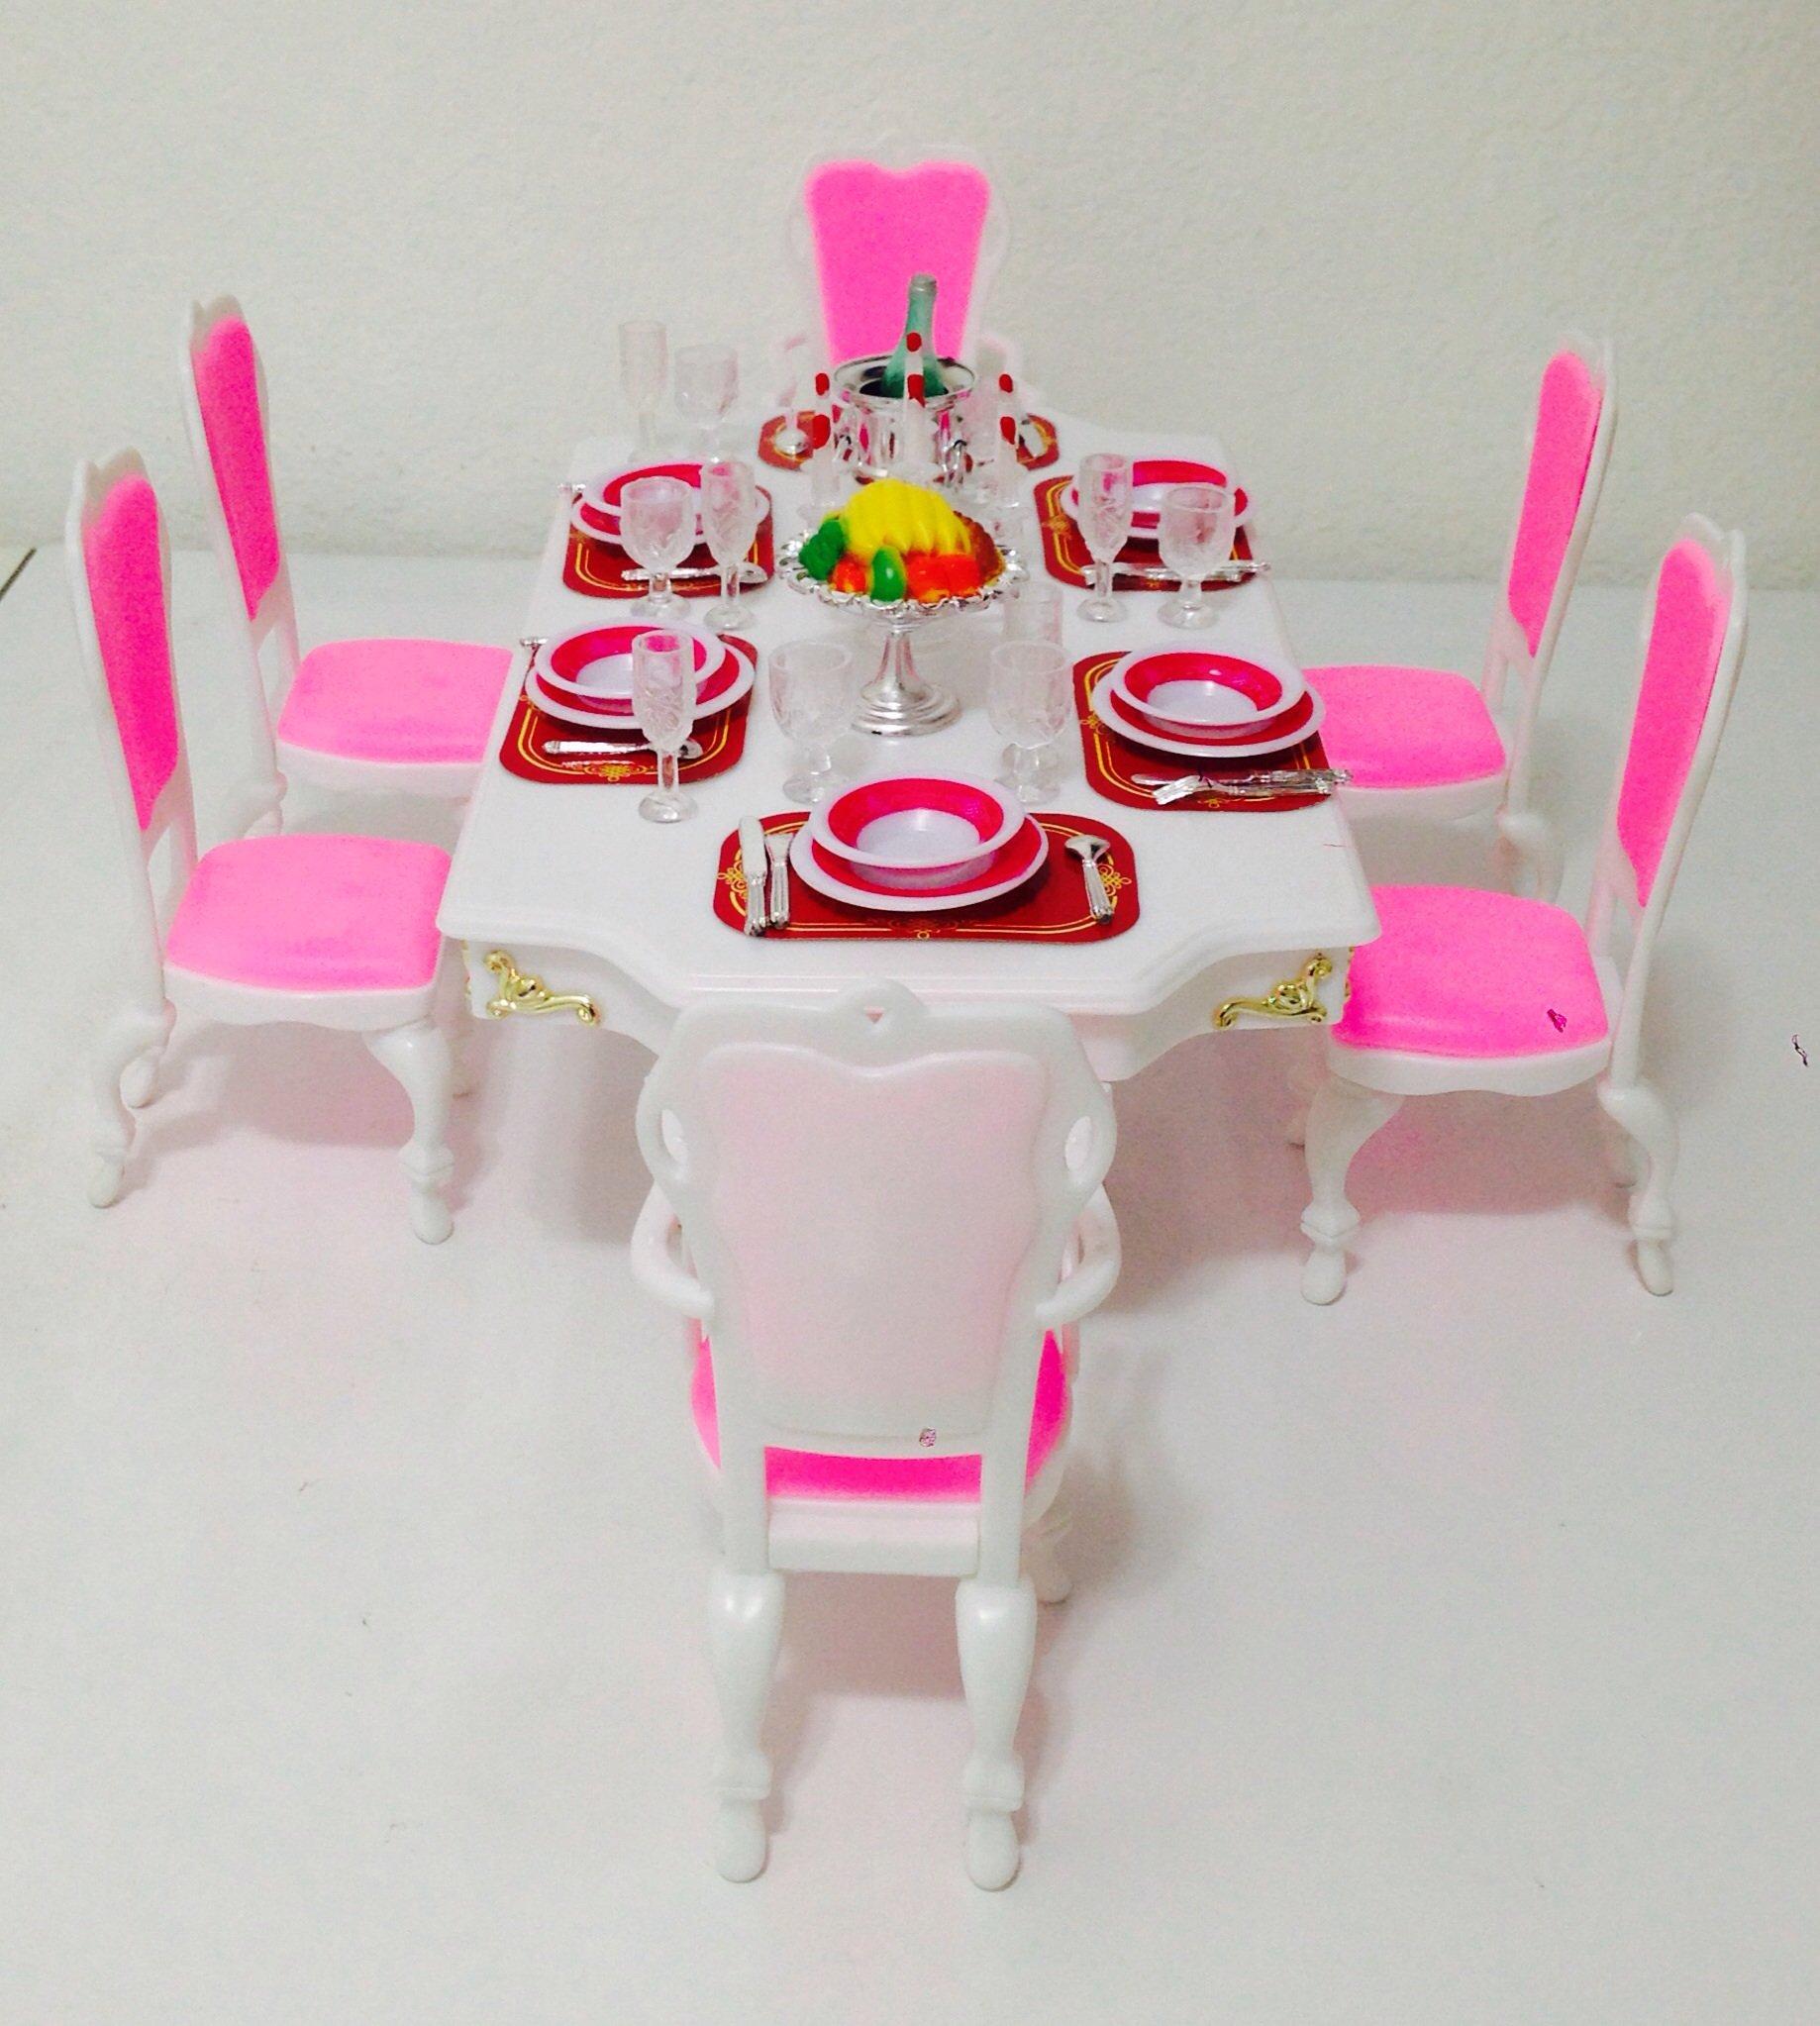 Barbie Dining Room Set: Amazon.com: Mini Furniture Flower Sofa Couch +2 Cushions